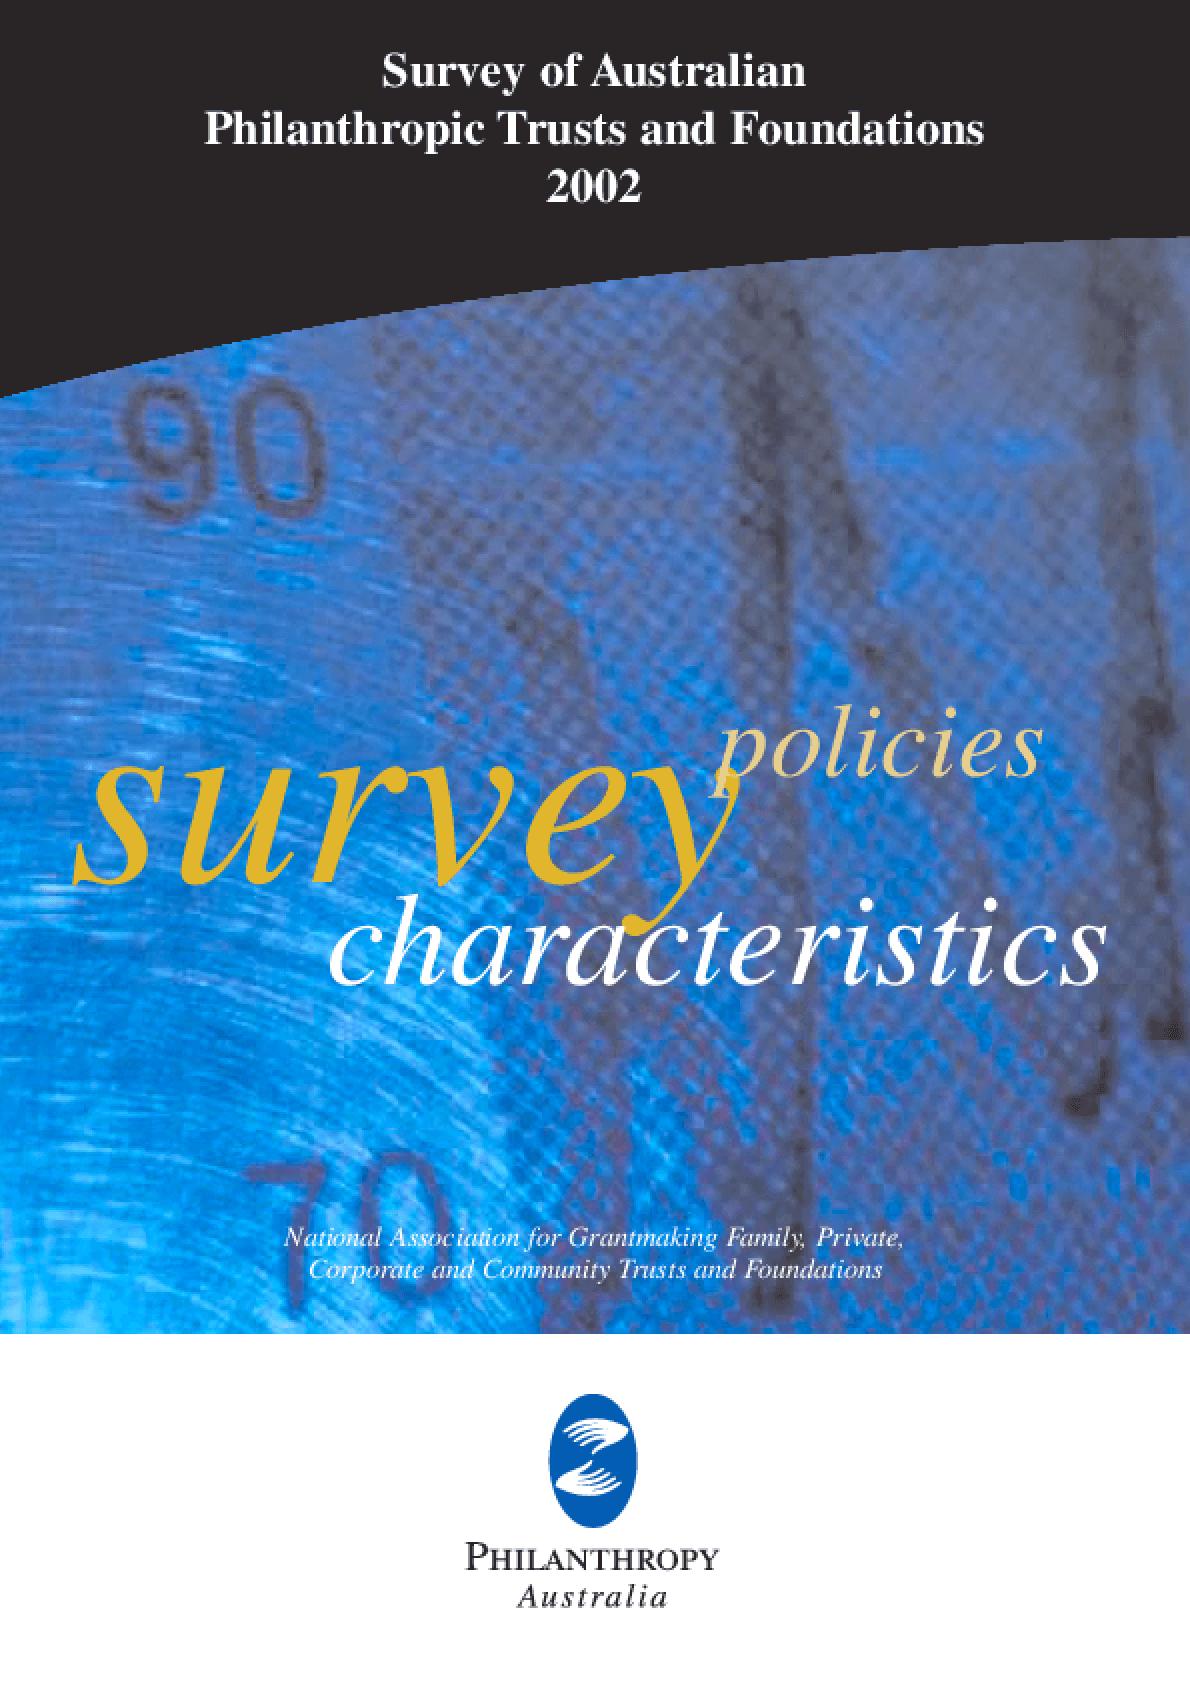 Survey of Australian Philanthropic Trusts and Foundations 2002